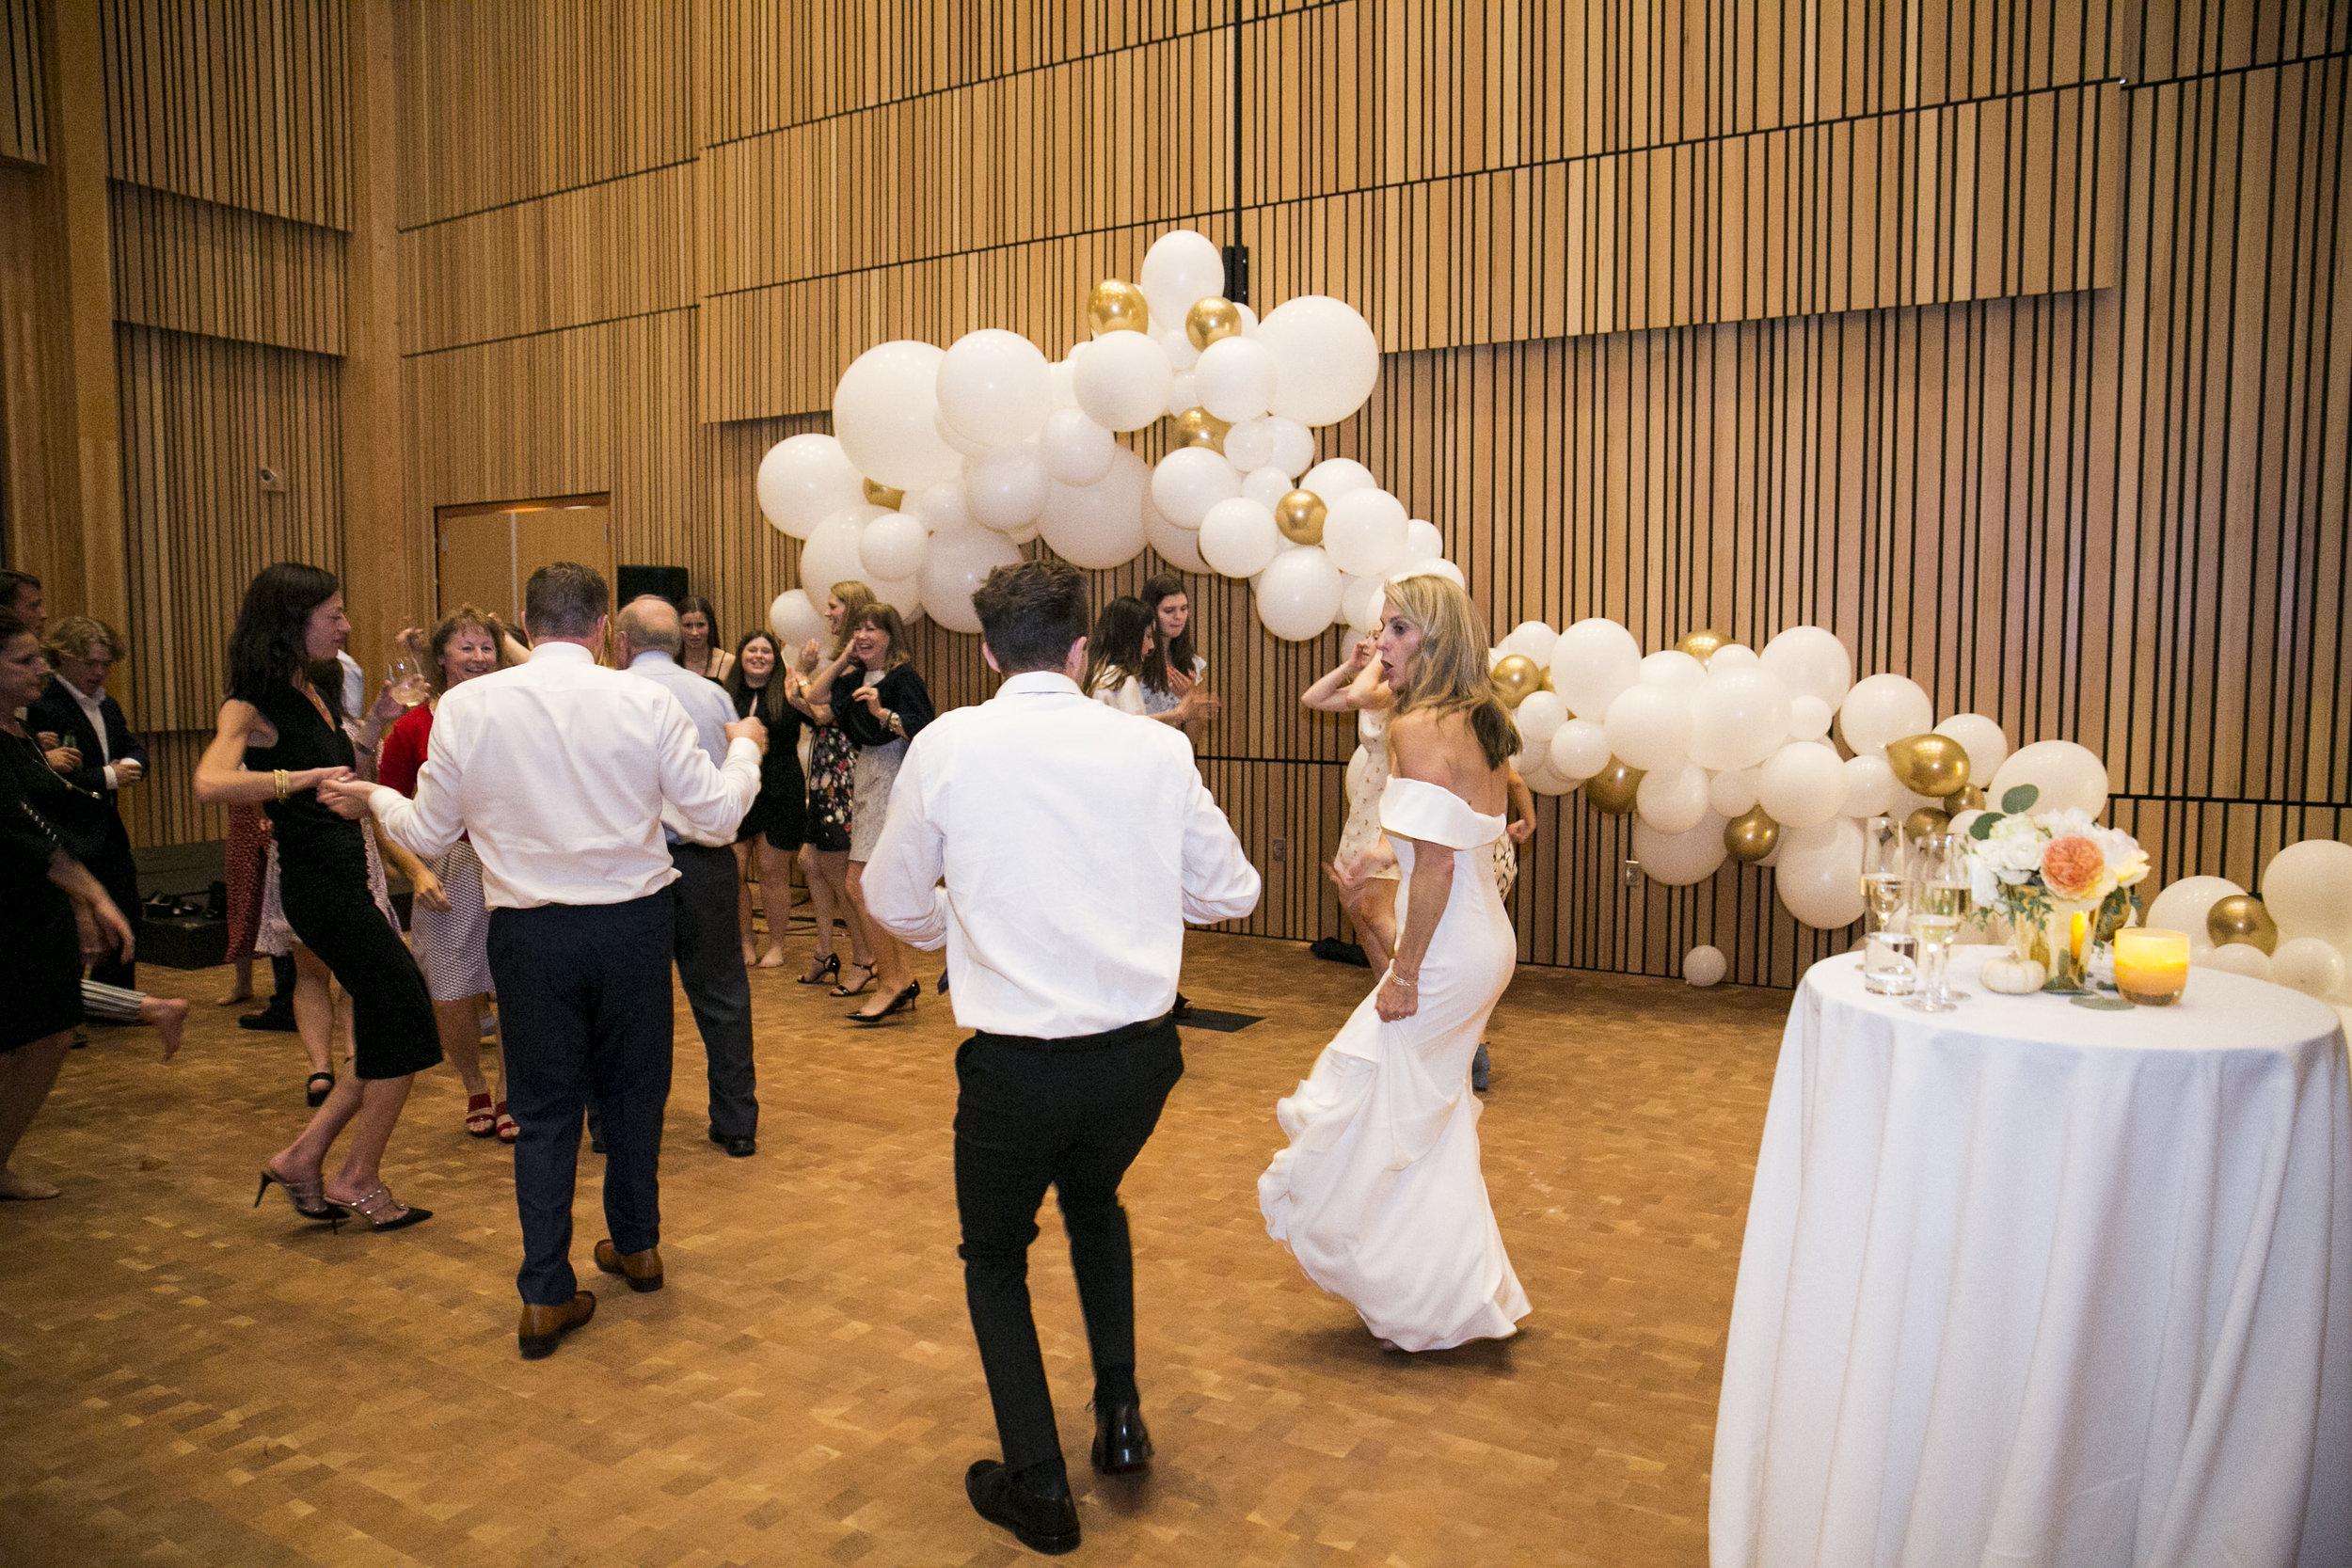 The dance floor was definitely on fire!